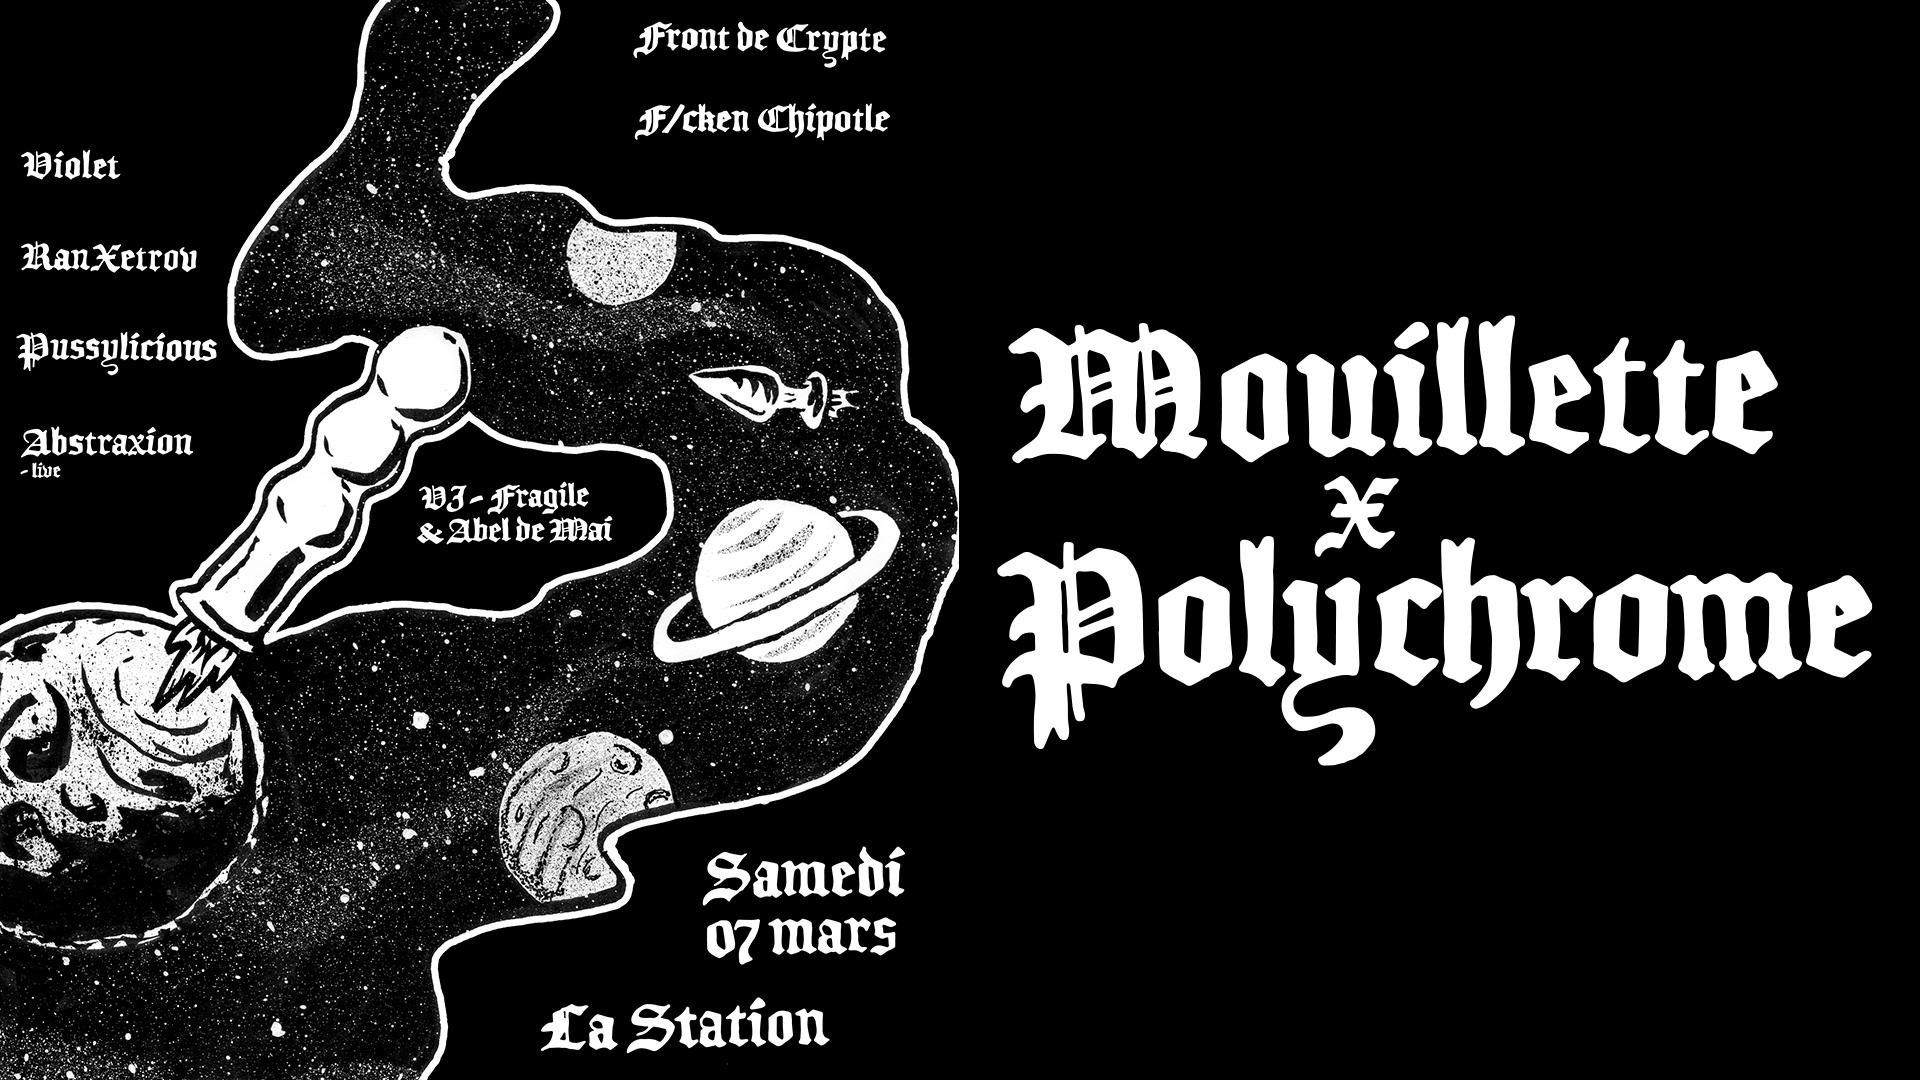 Mouillette x Polychrome x La Station